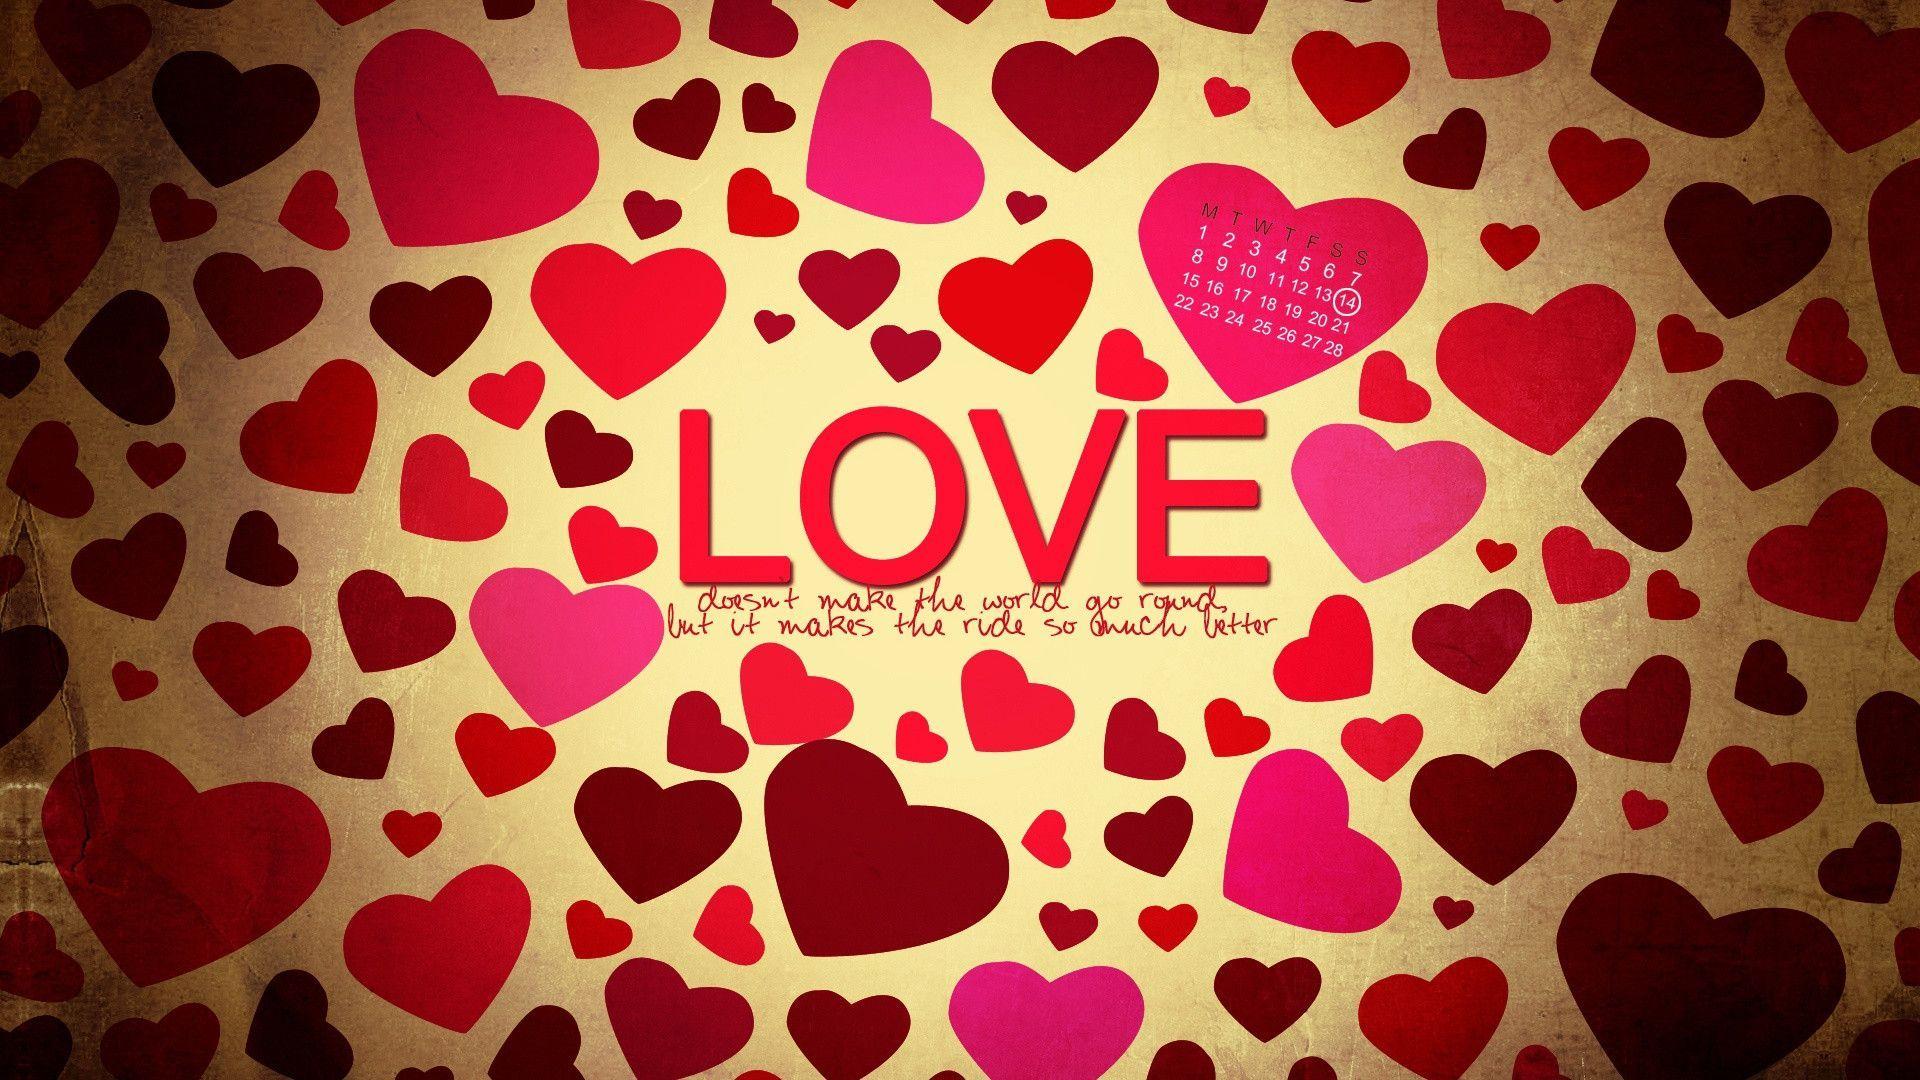 Wallpaper download love hd - Romantic And Cute Love Couple Hd Wallpapers 800 500 Wallpapers Hd Love 37 Wallpapers